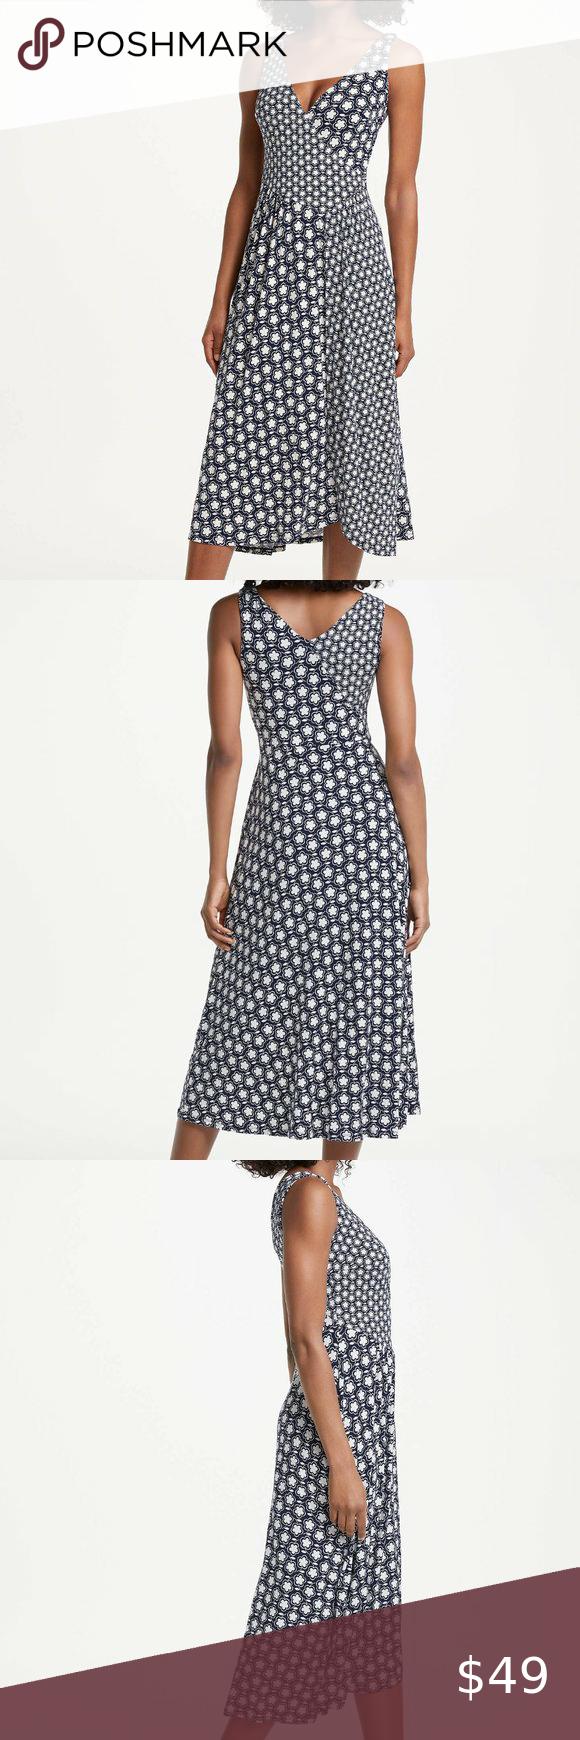 Boden Floral Jennifer Jersey Midi Dress 10r Clothes Design Midi Dress Dresses [ 1740 x 580 Pixel ]